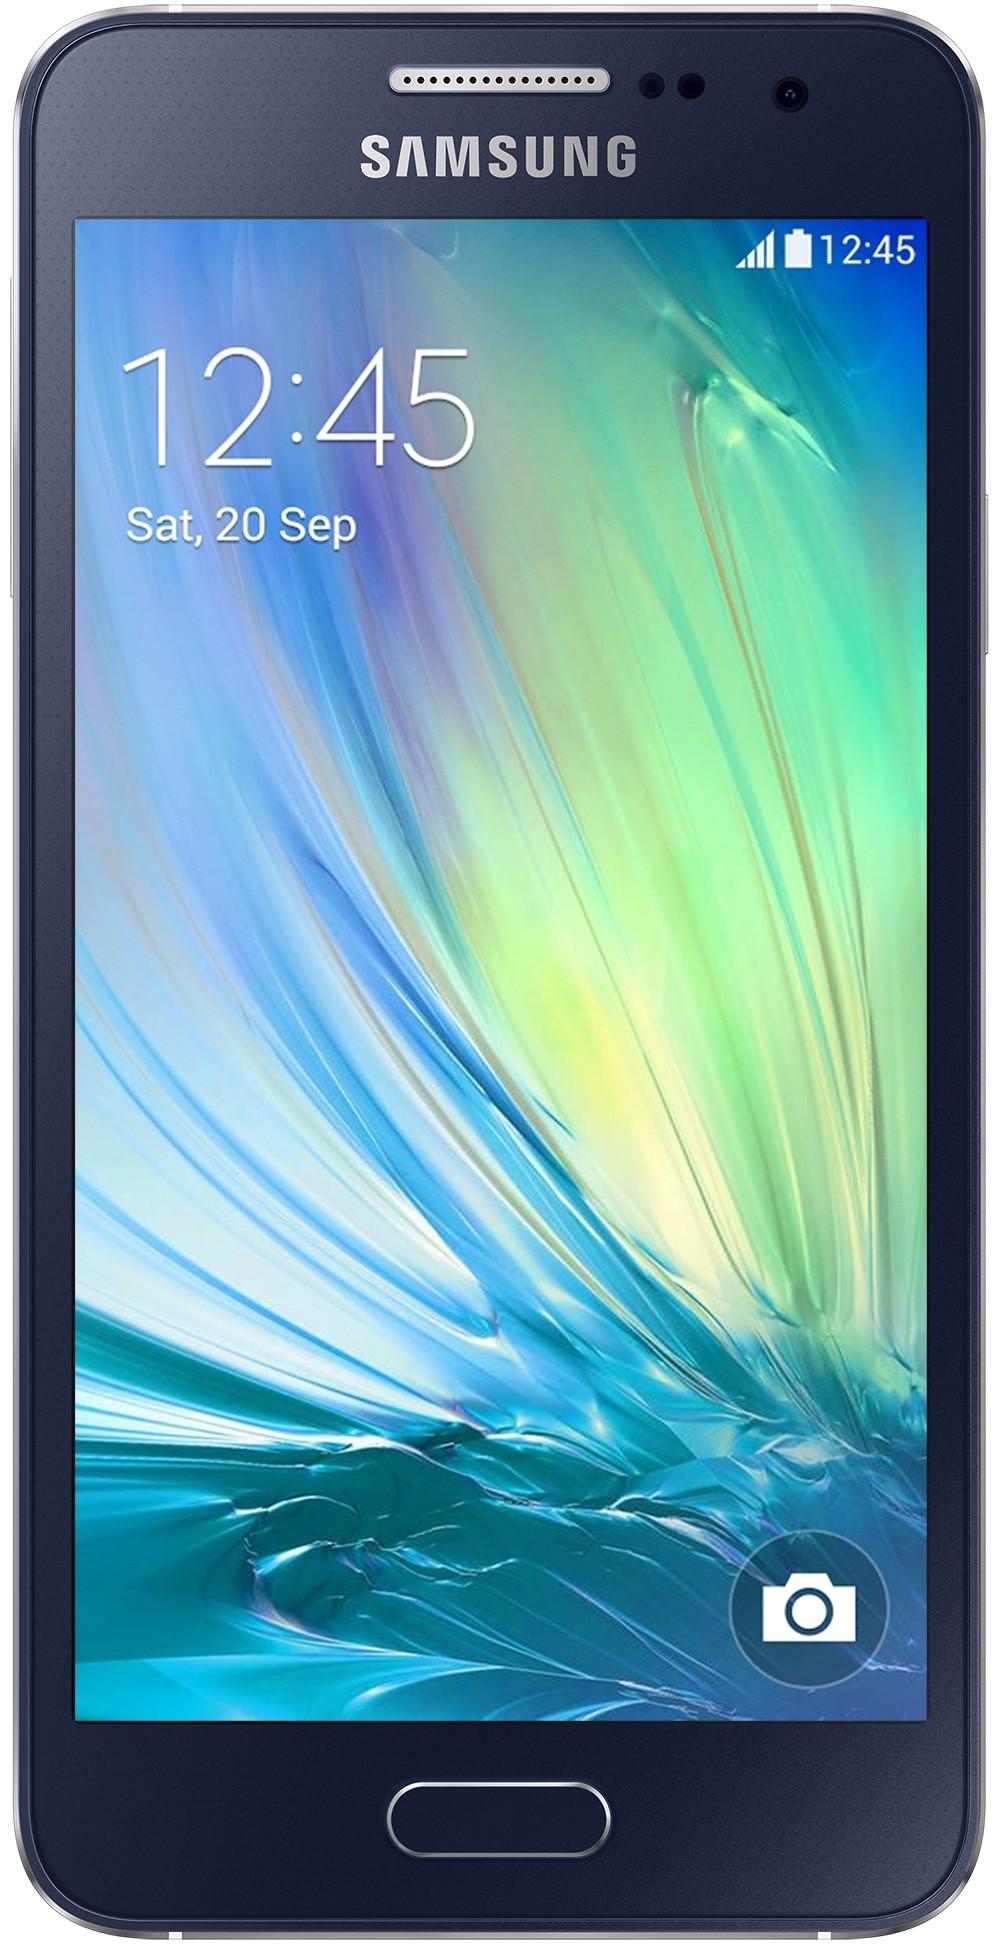 Reparatie Galaxy A3 (2015) scherm reparatie